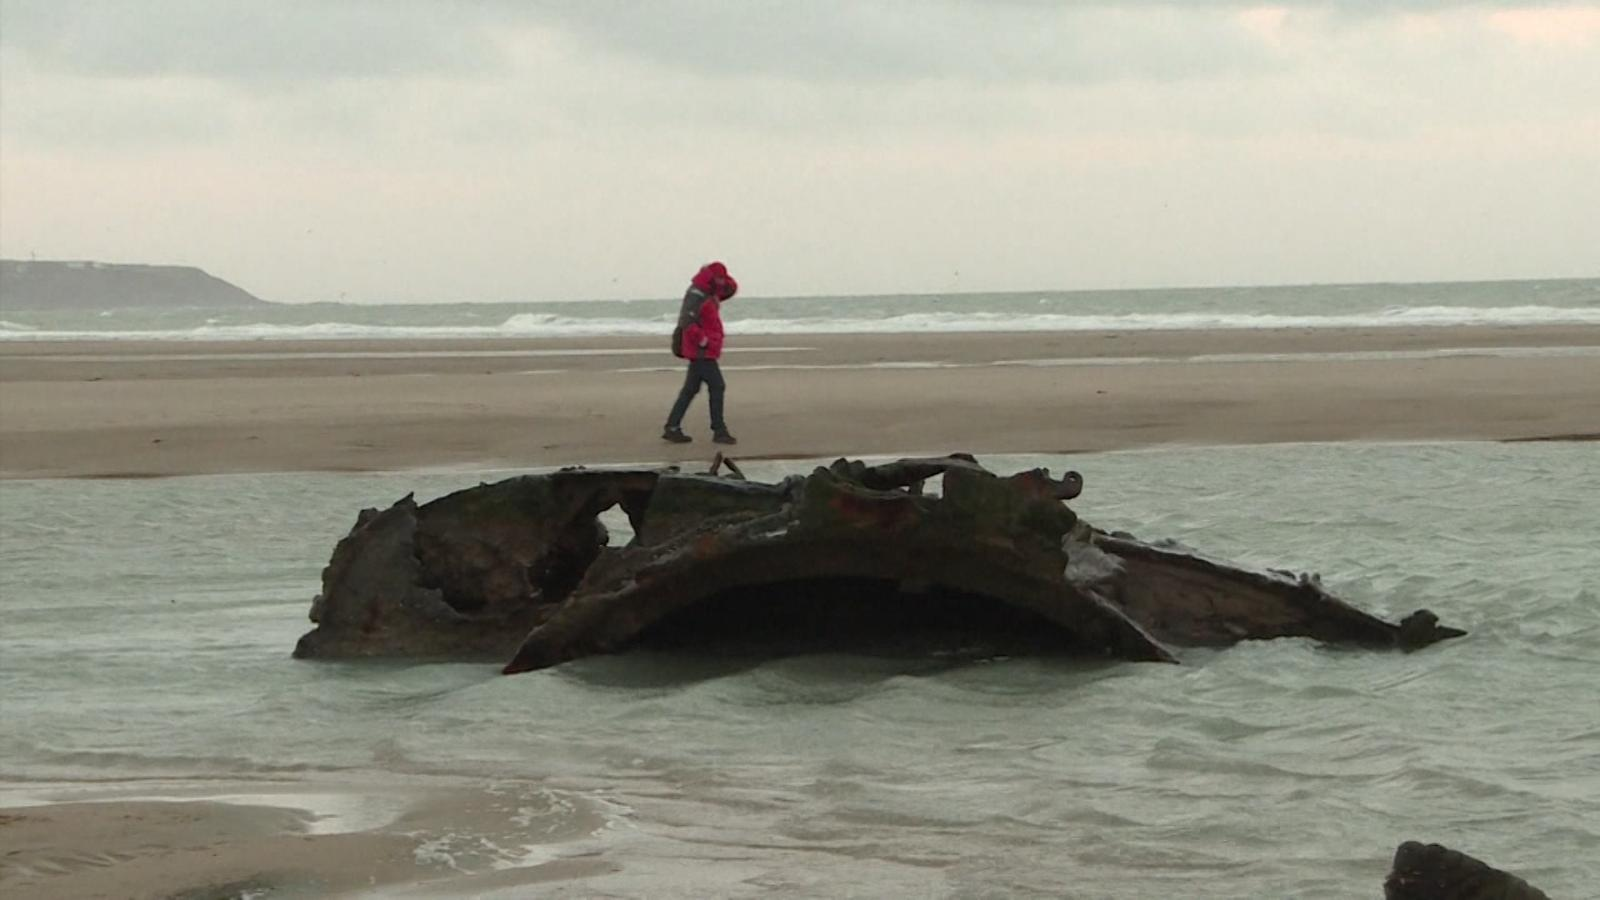 wreck of wwi german u-boat revealed